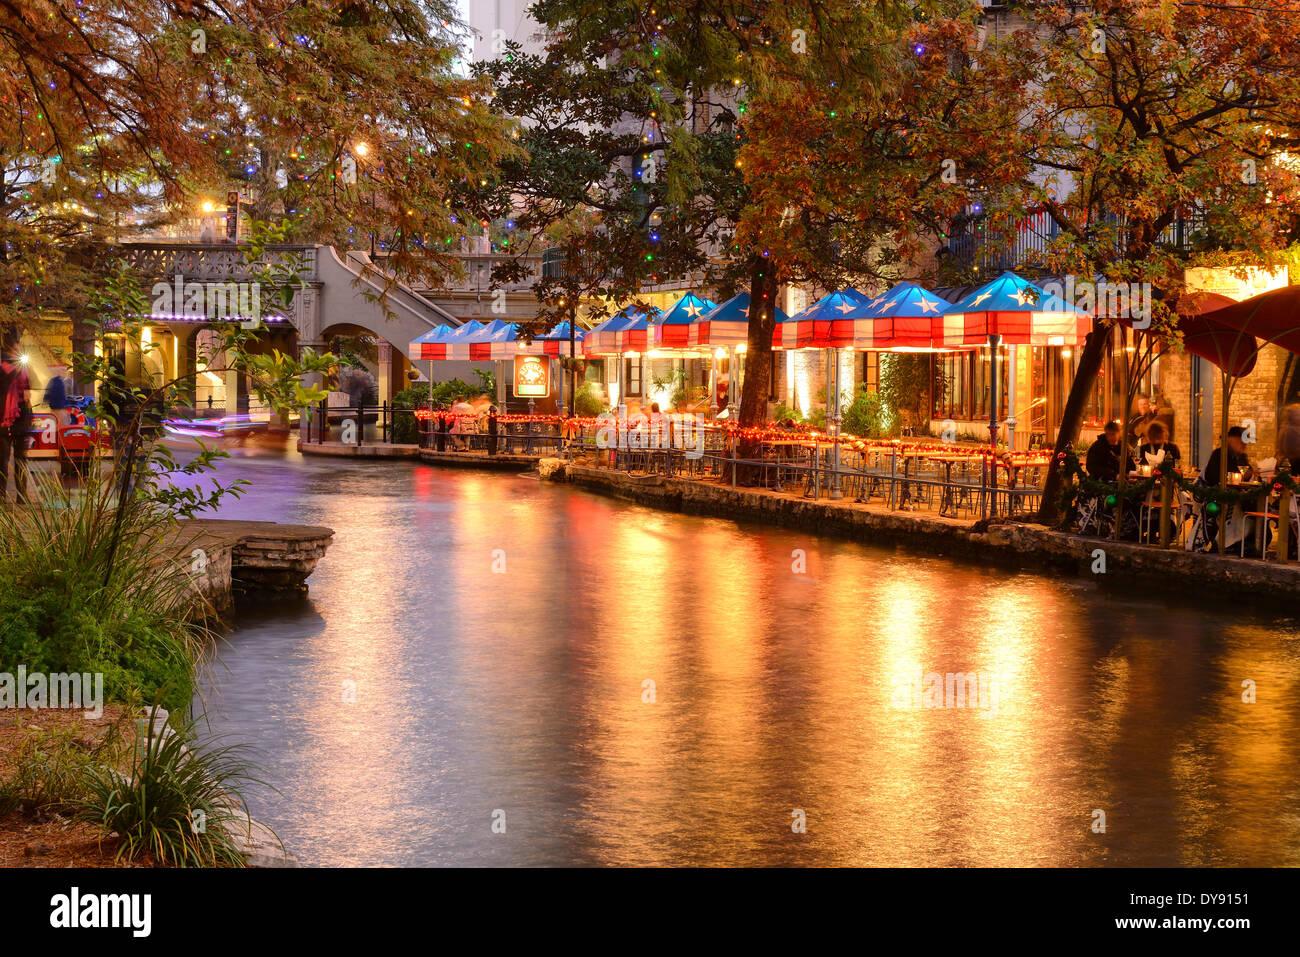 USA, United States, America, Texas, San Antonio, River Walk, water, dusk, lights, dining, attraction, evening - Stock Image